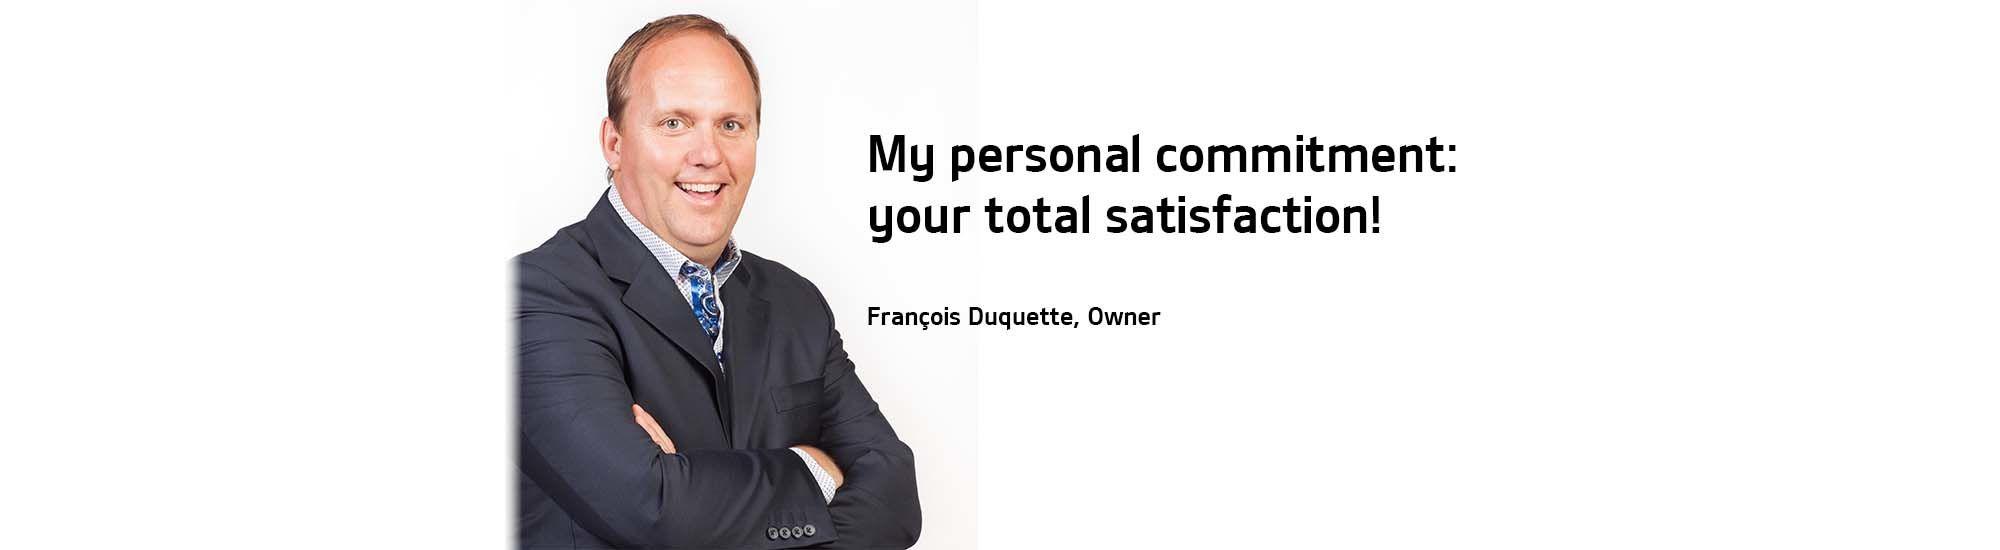 My commitment